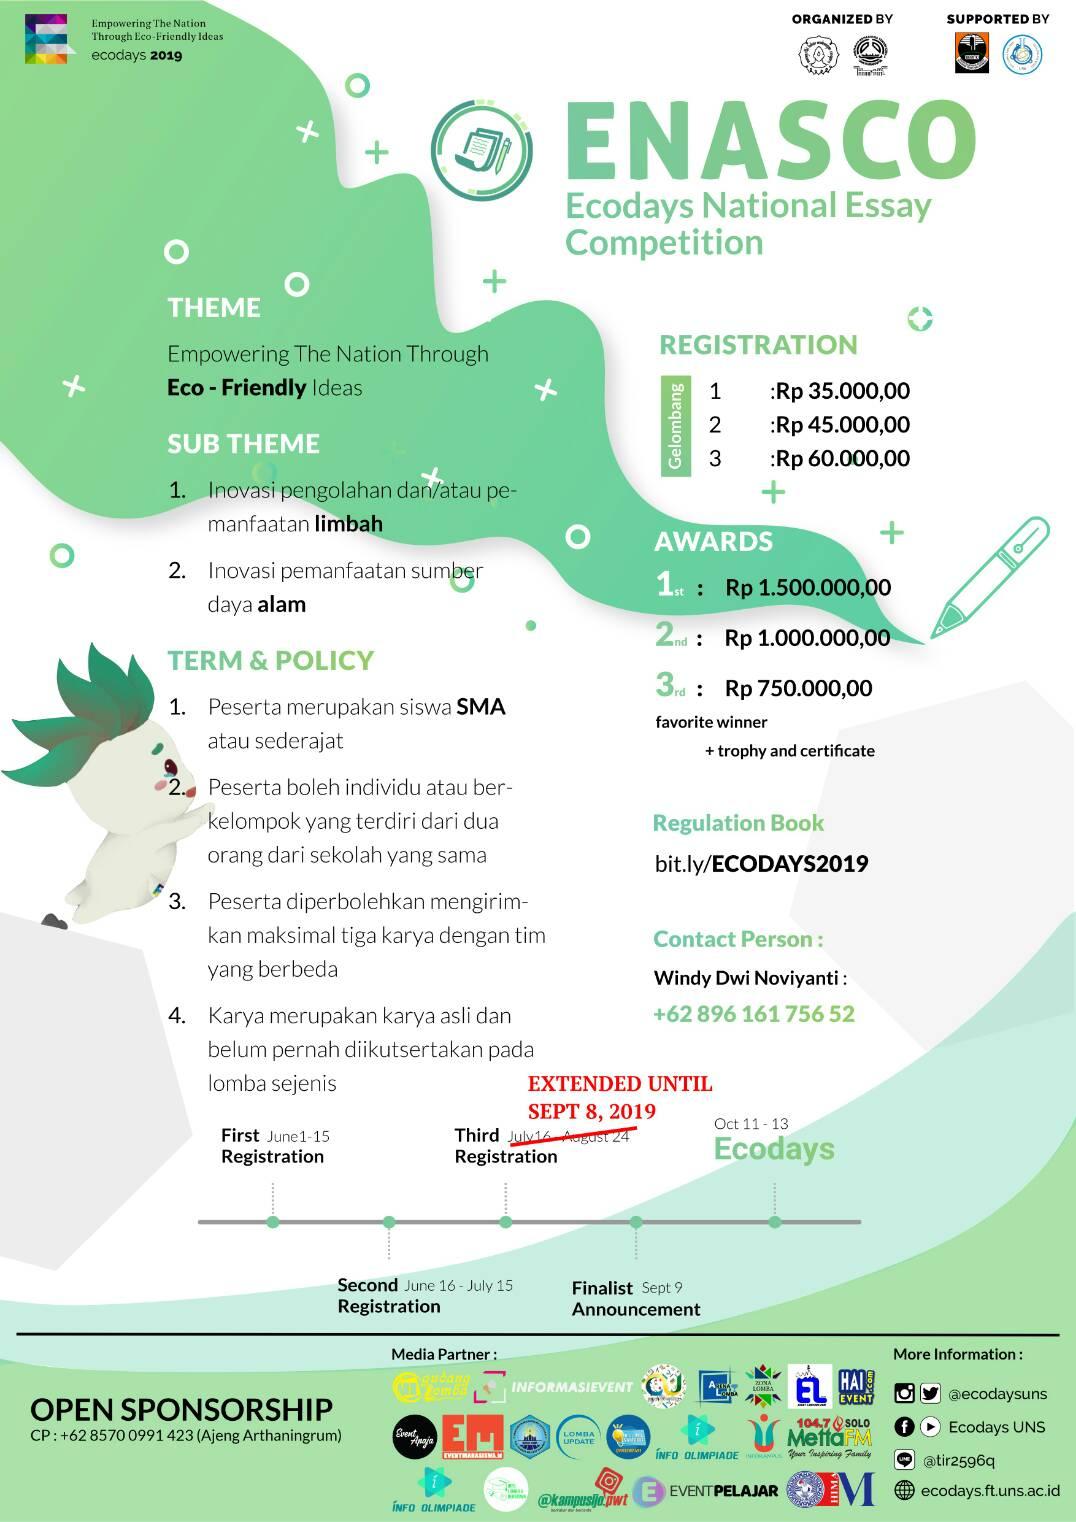 ENASCO Ecodays National Essay Competition 2019